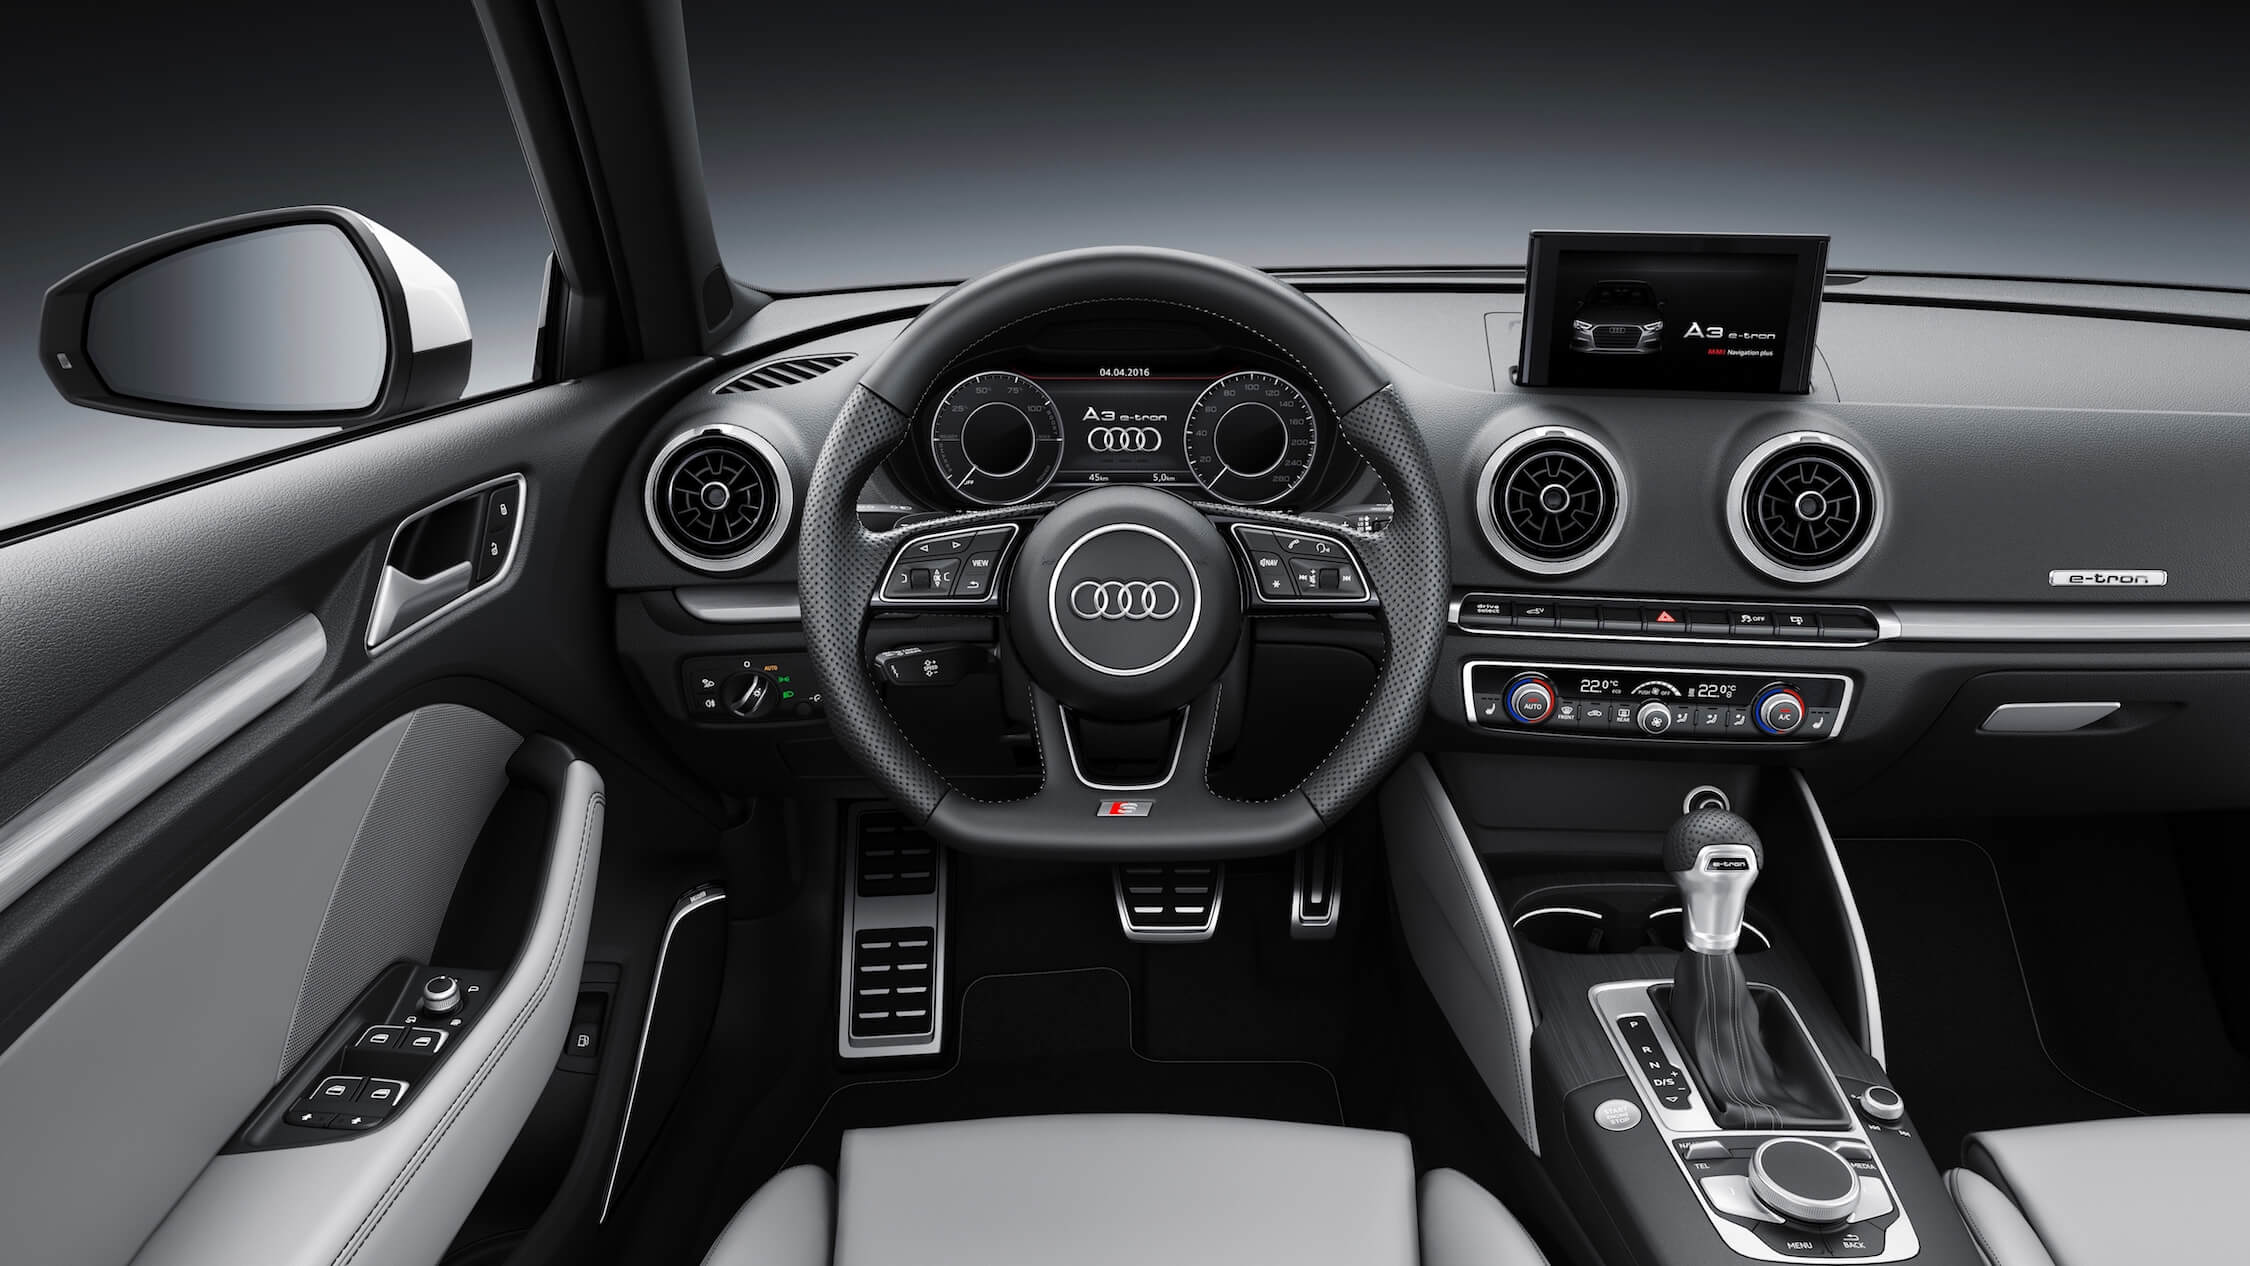 Audi A3 hybride interieur